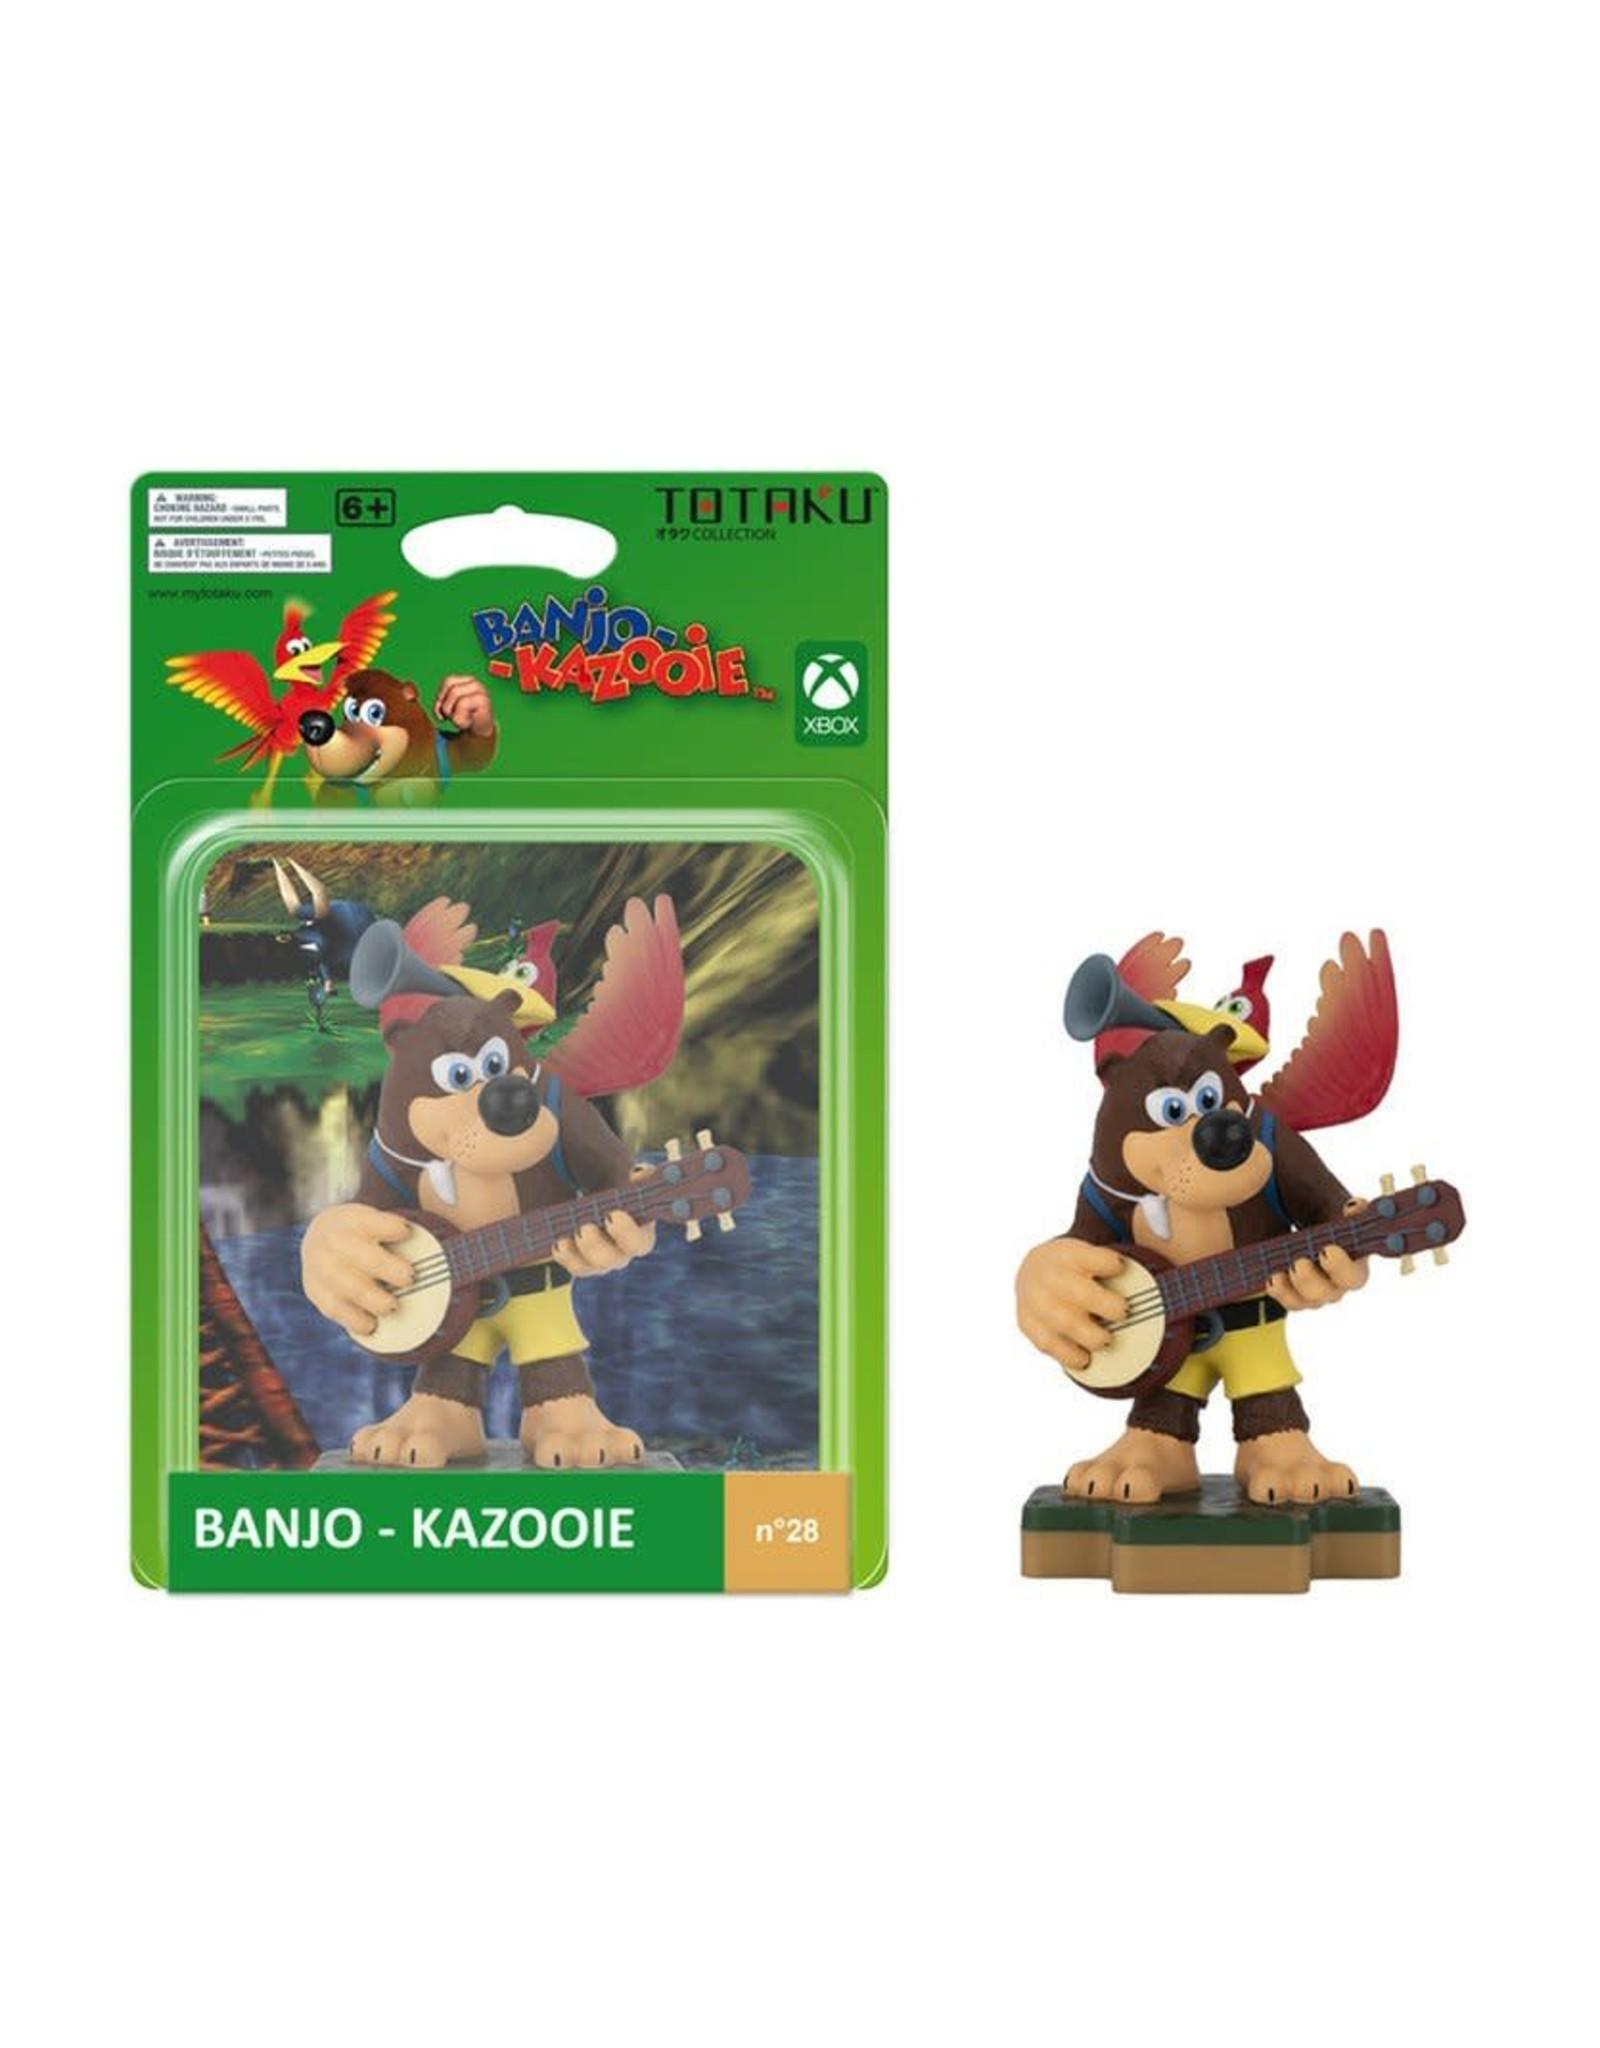 Xbox Banjo - Kazooie: Banjo - Kazooie Totaku (Brand New)